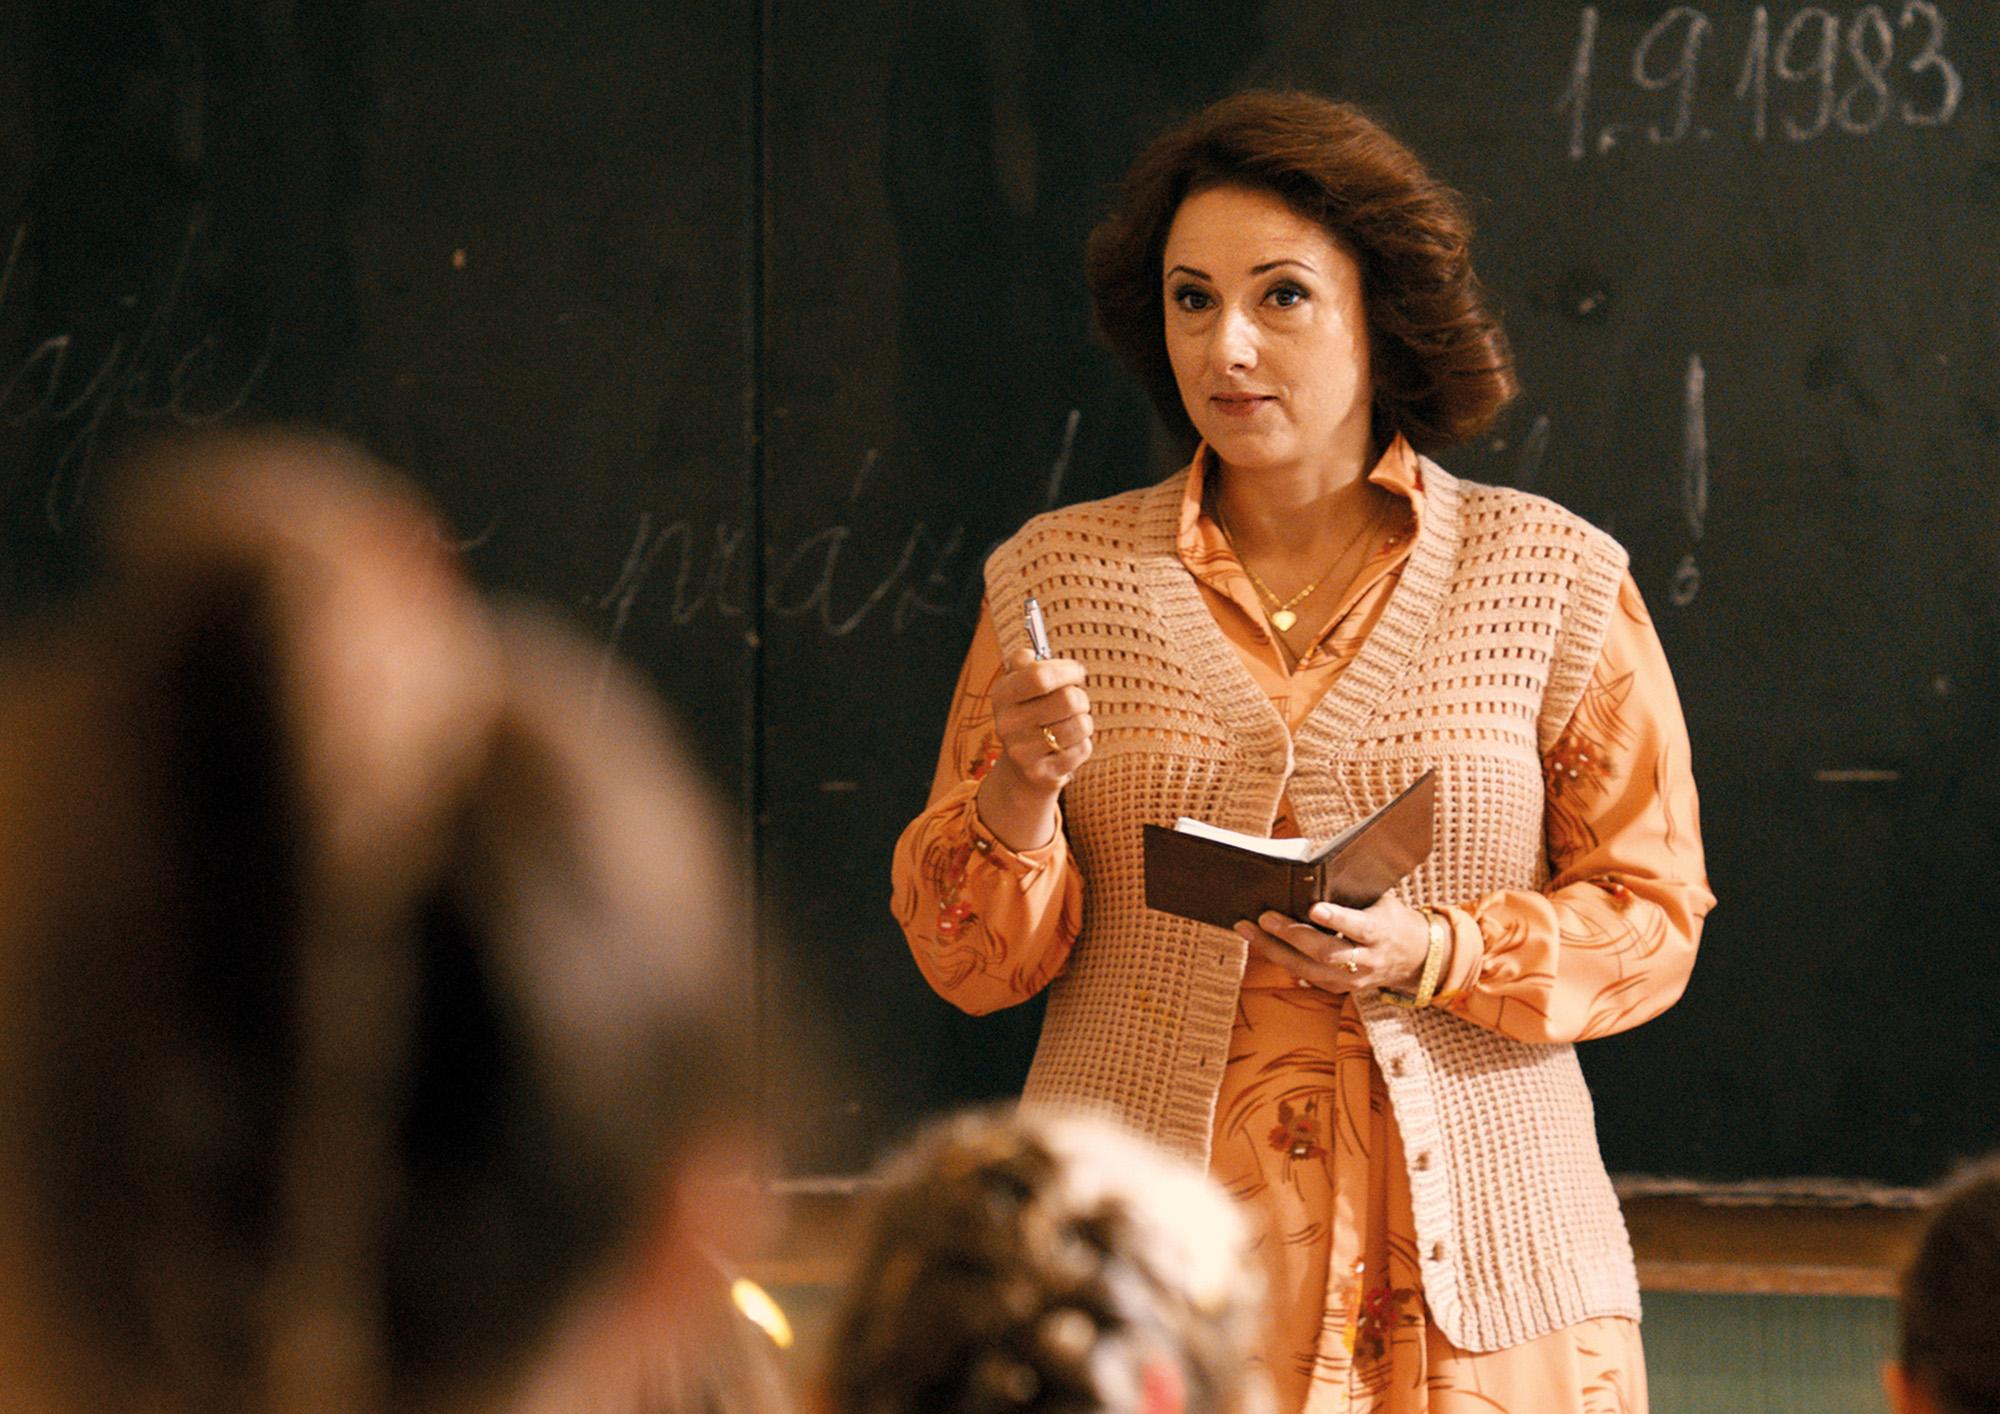 Nauczycielka (1)